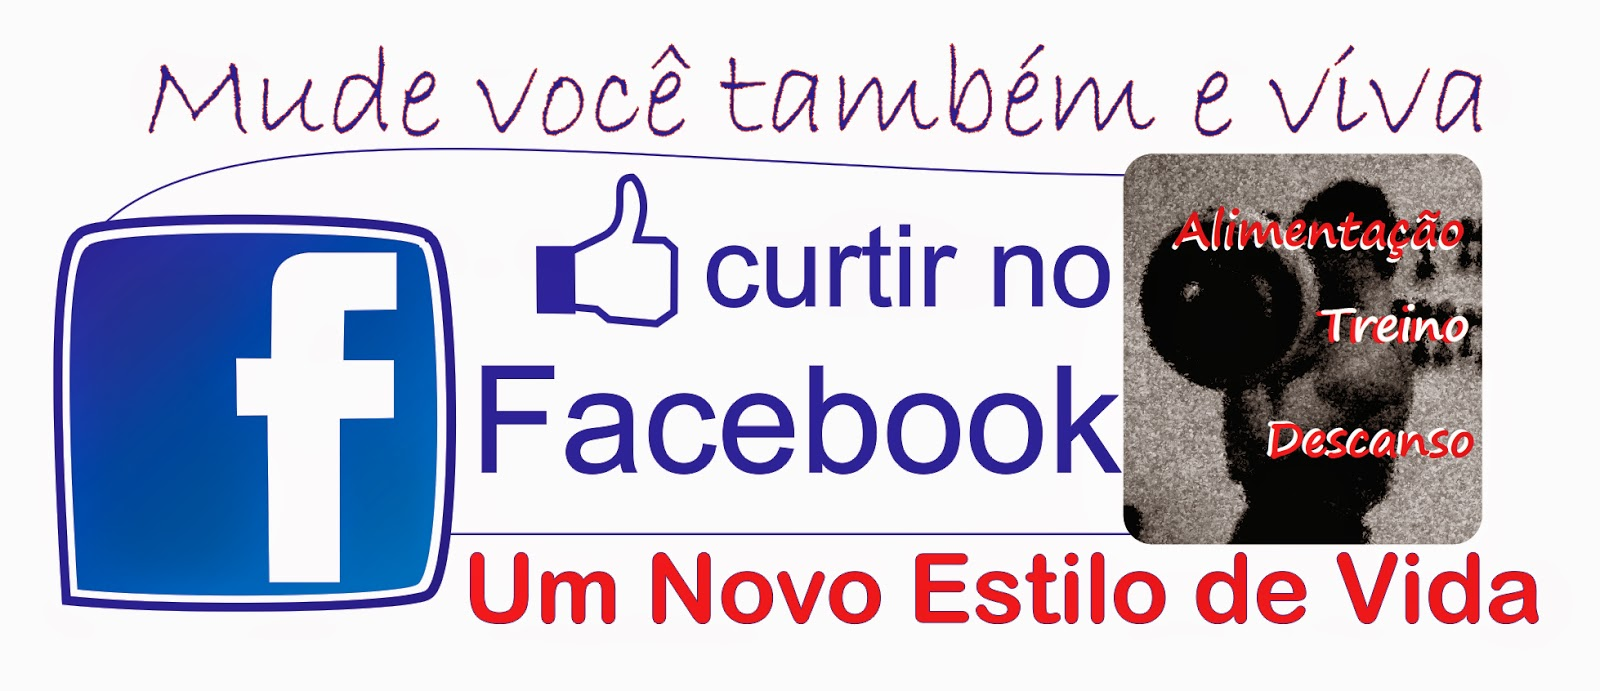 https://www.facebook.com/mudandoestilodevida?ref_type=bookmark